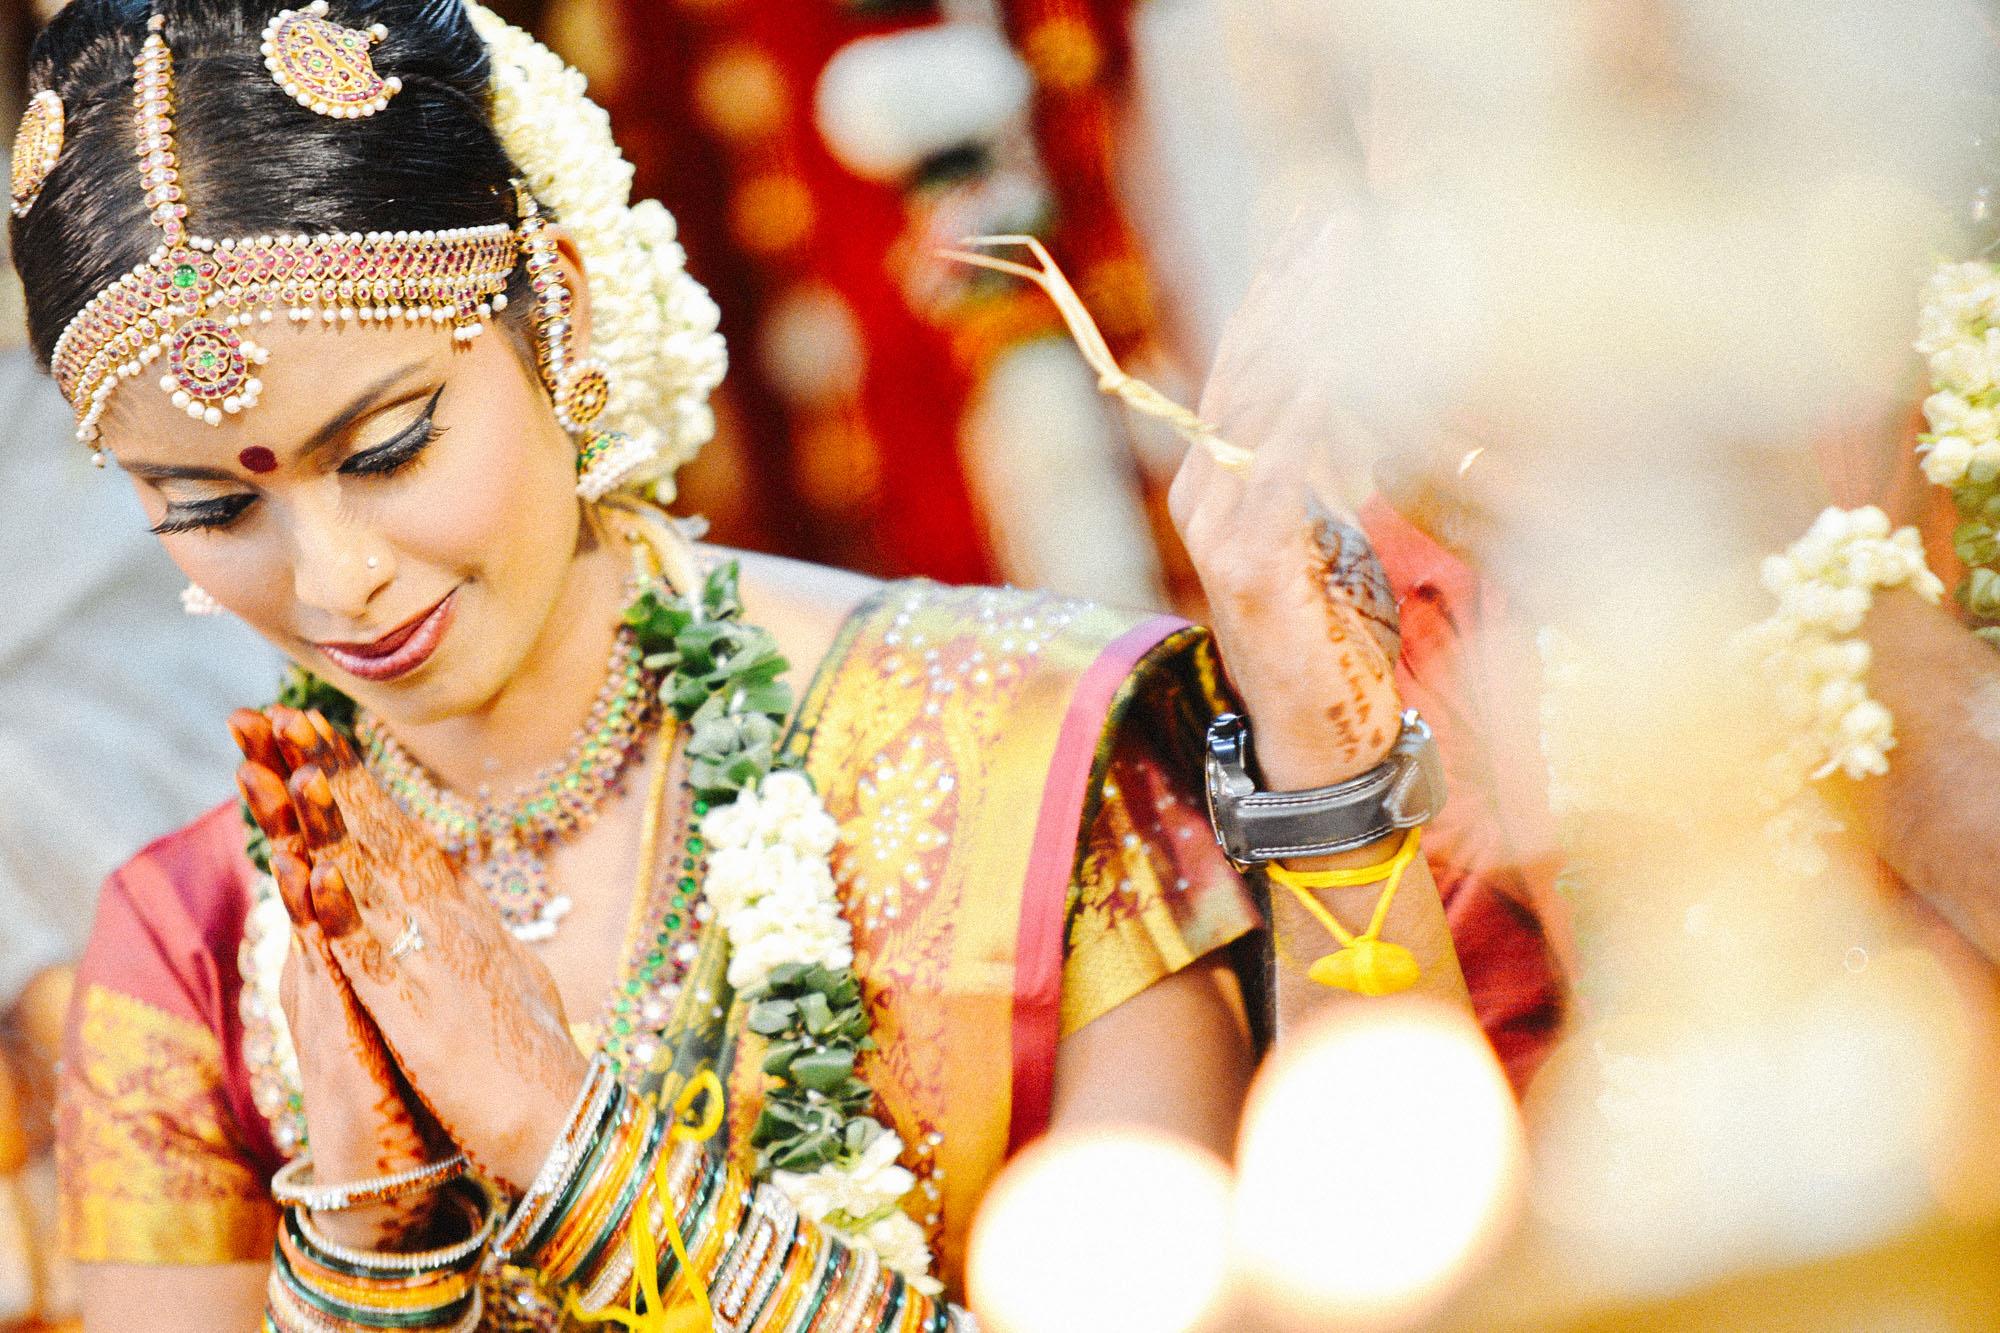 Amore_Production_Indian_Wedding_Photographer_William (90)